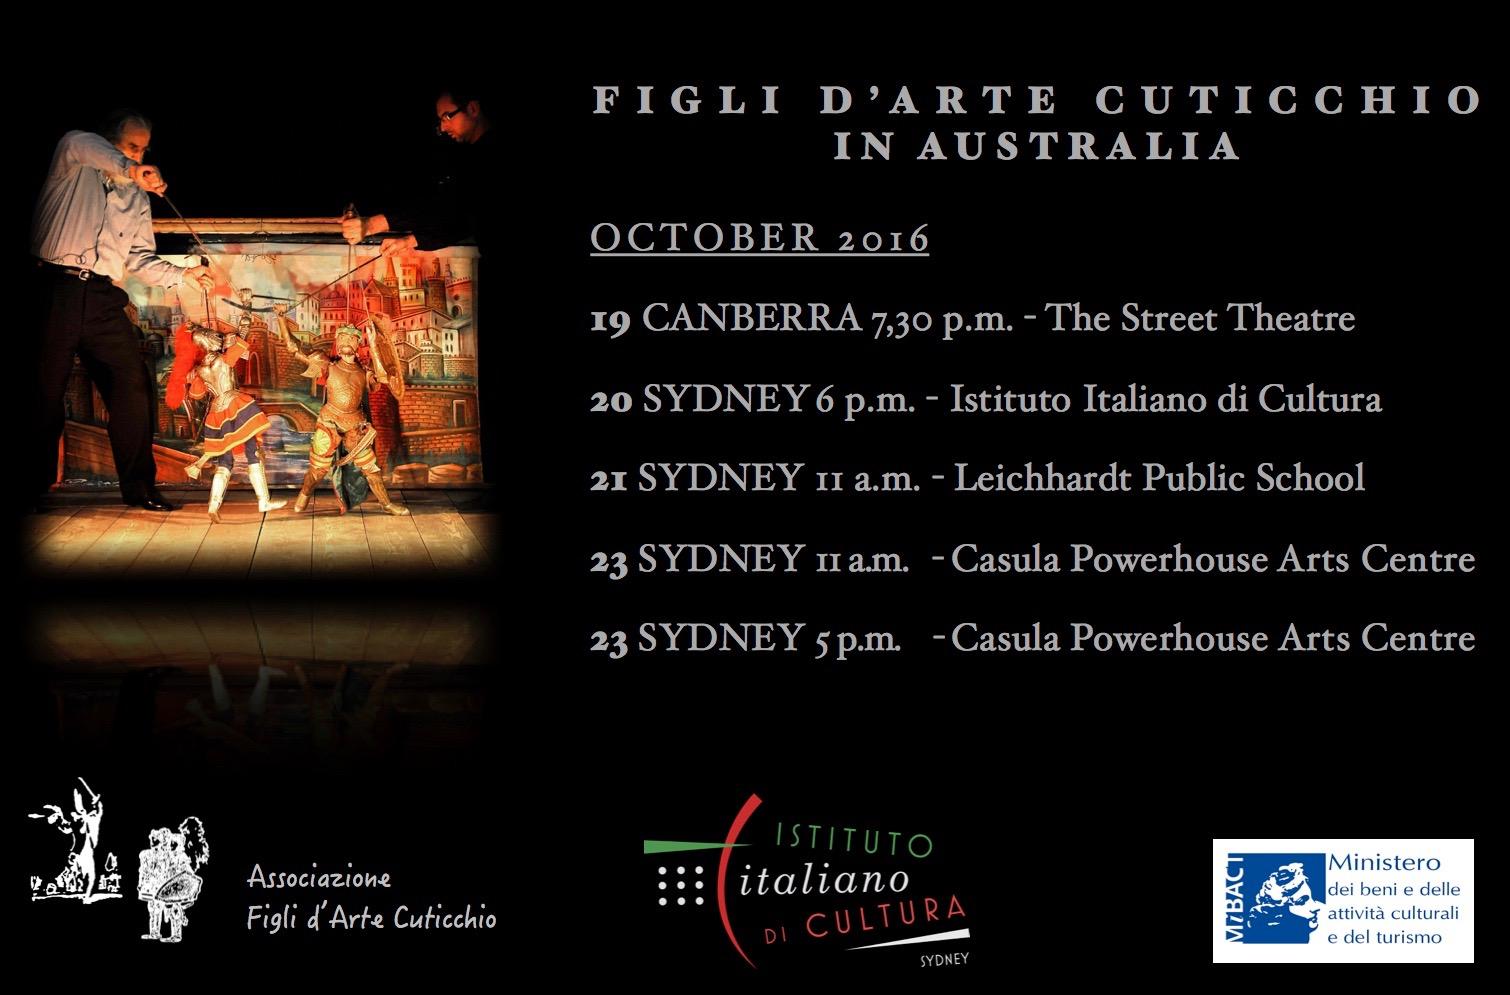 AUSTRALIA COMING SOON OCTOBER 2016 19 CANBERRA 7,30 p.m. - The Street Theatre 20 SYDNEY 6 p.m. - Istituto Italiano di Cultura 21 SYDNEY 11 a.m. - Leichhardt Public School 23 SYDNEY 11 a.m. - Casula Powerhouse Arts Centre 23 SYDNEY 5 p.m. - Casula Powerhouse Arts Centre